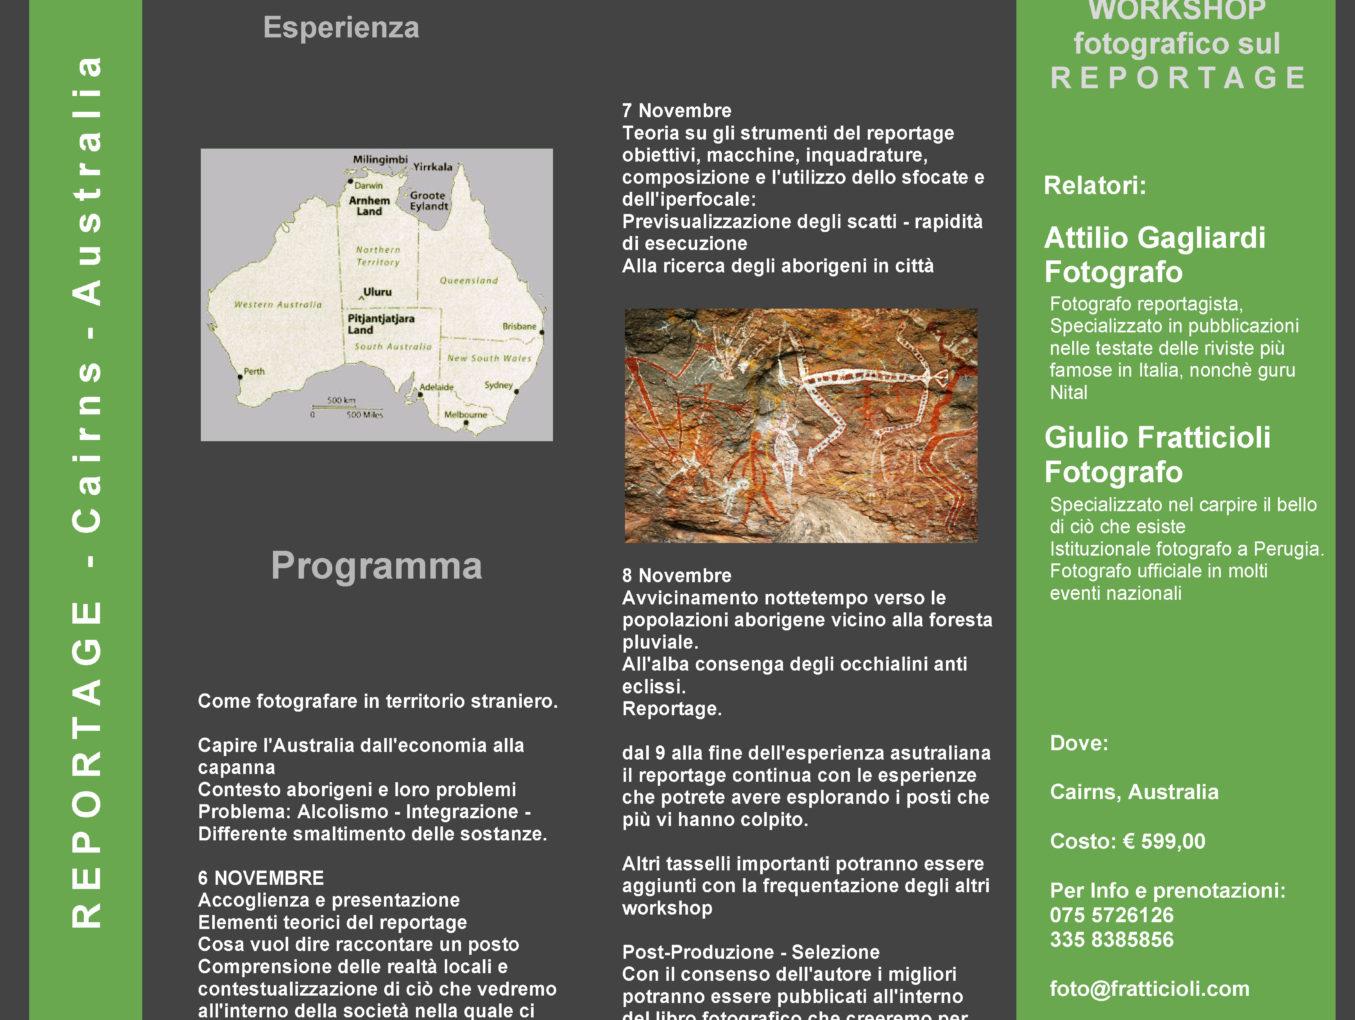 Workshop: Il Reportage